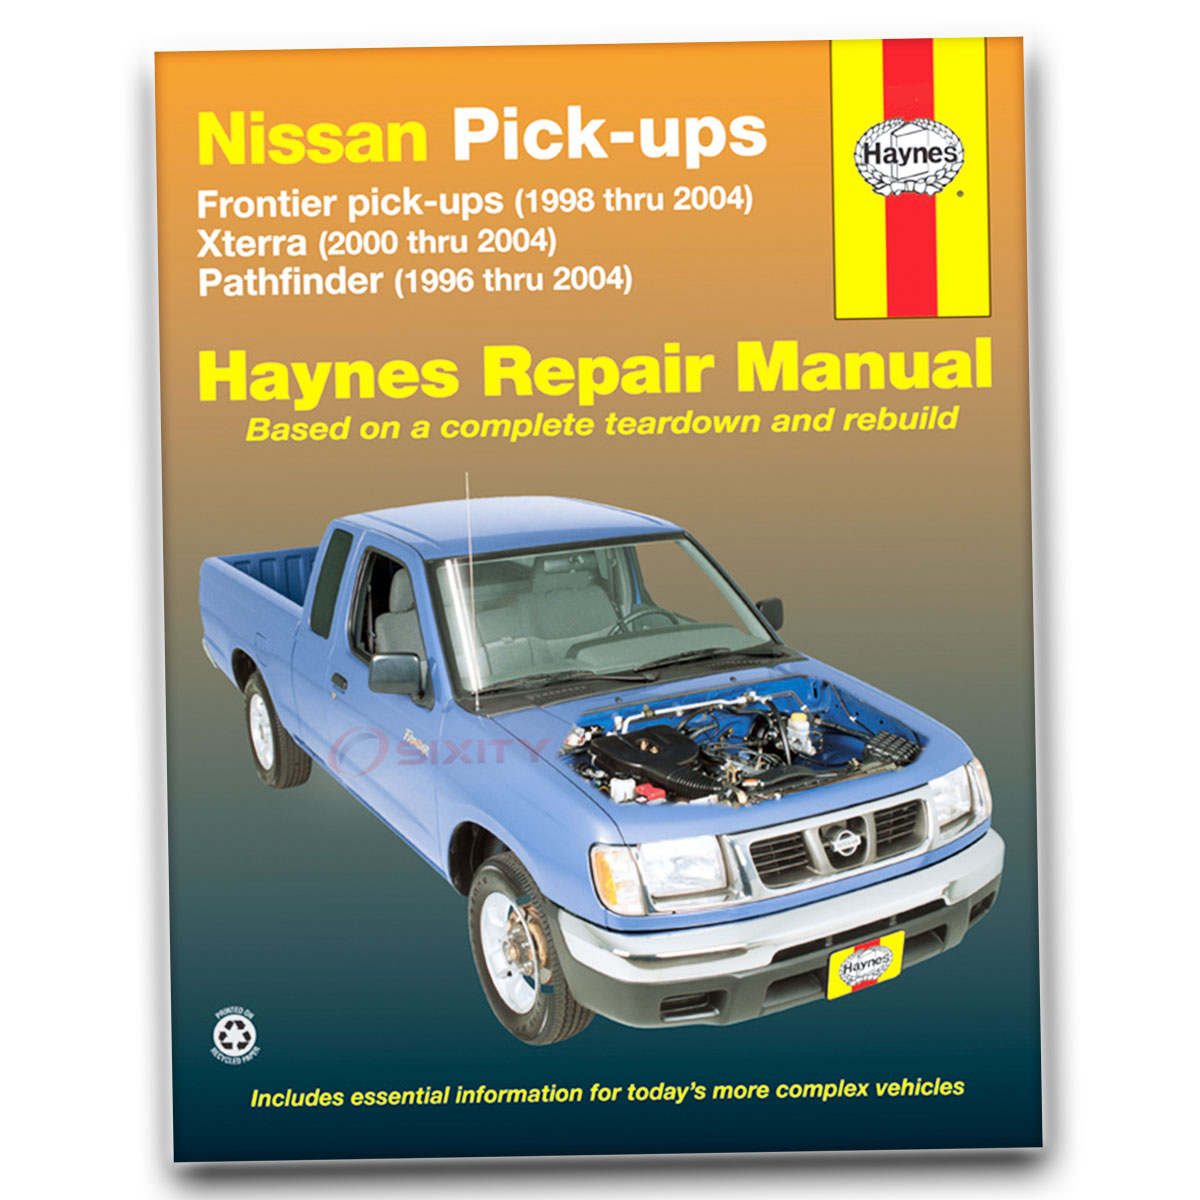 Haynes Repair Manual for Nissan Pathfinder XE LE SE Armada Shop Service ay